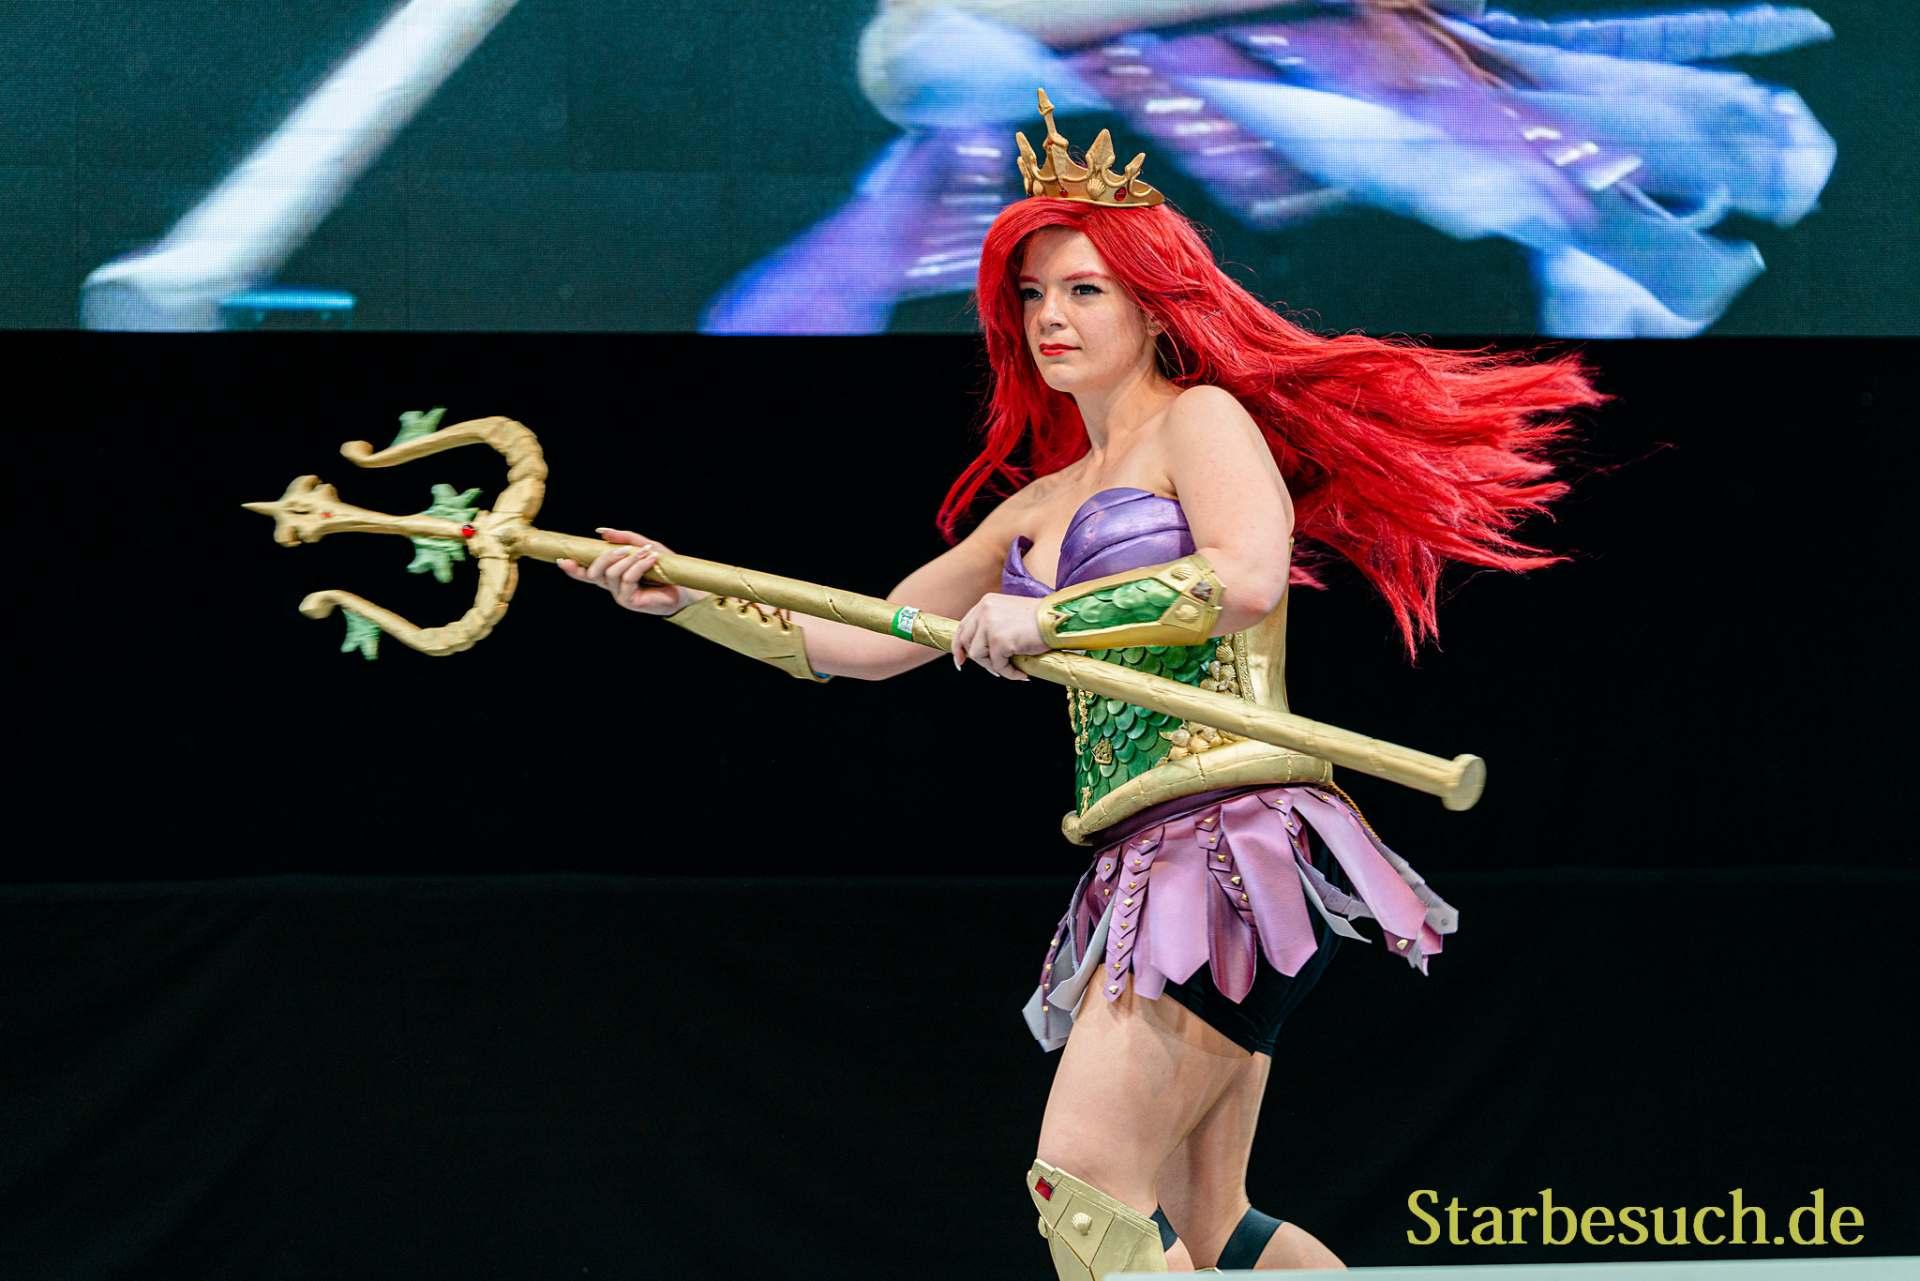 Cosplay Contest #28: Cessa Cosplay as Warrior Arielle from Arielle die Meerjungfrau